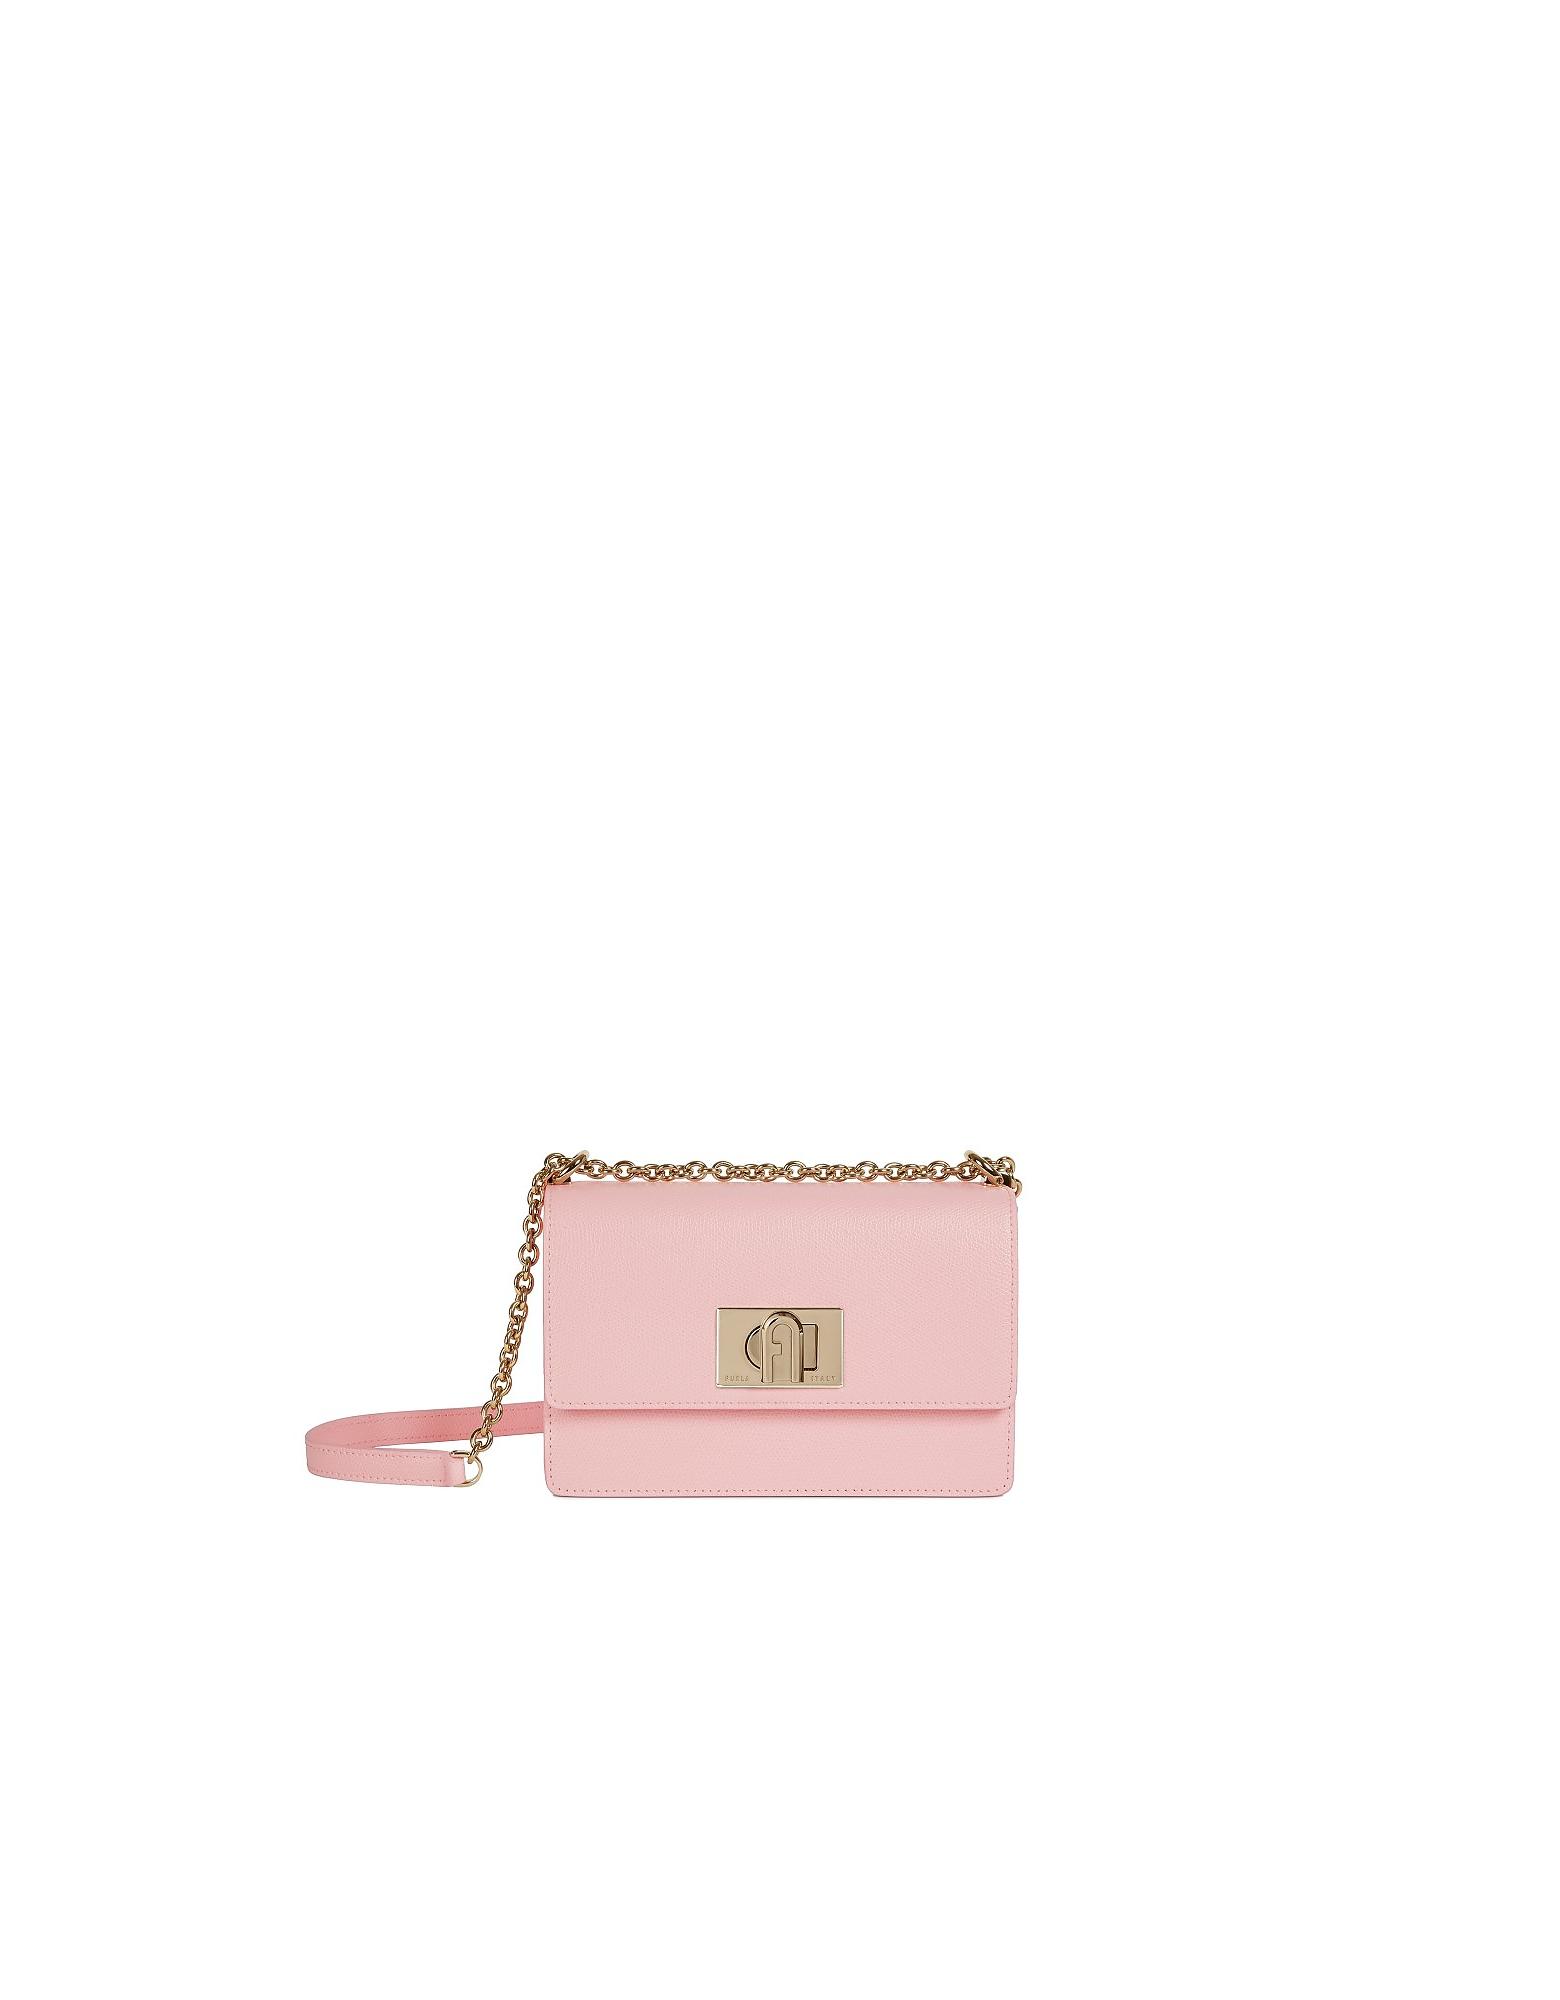 Furla Designer Handbags, Pink 1927 Mini Crossbody Bag 20